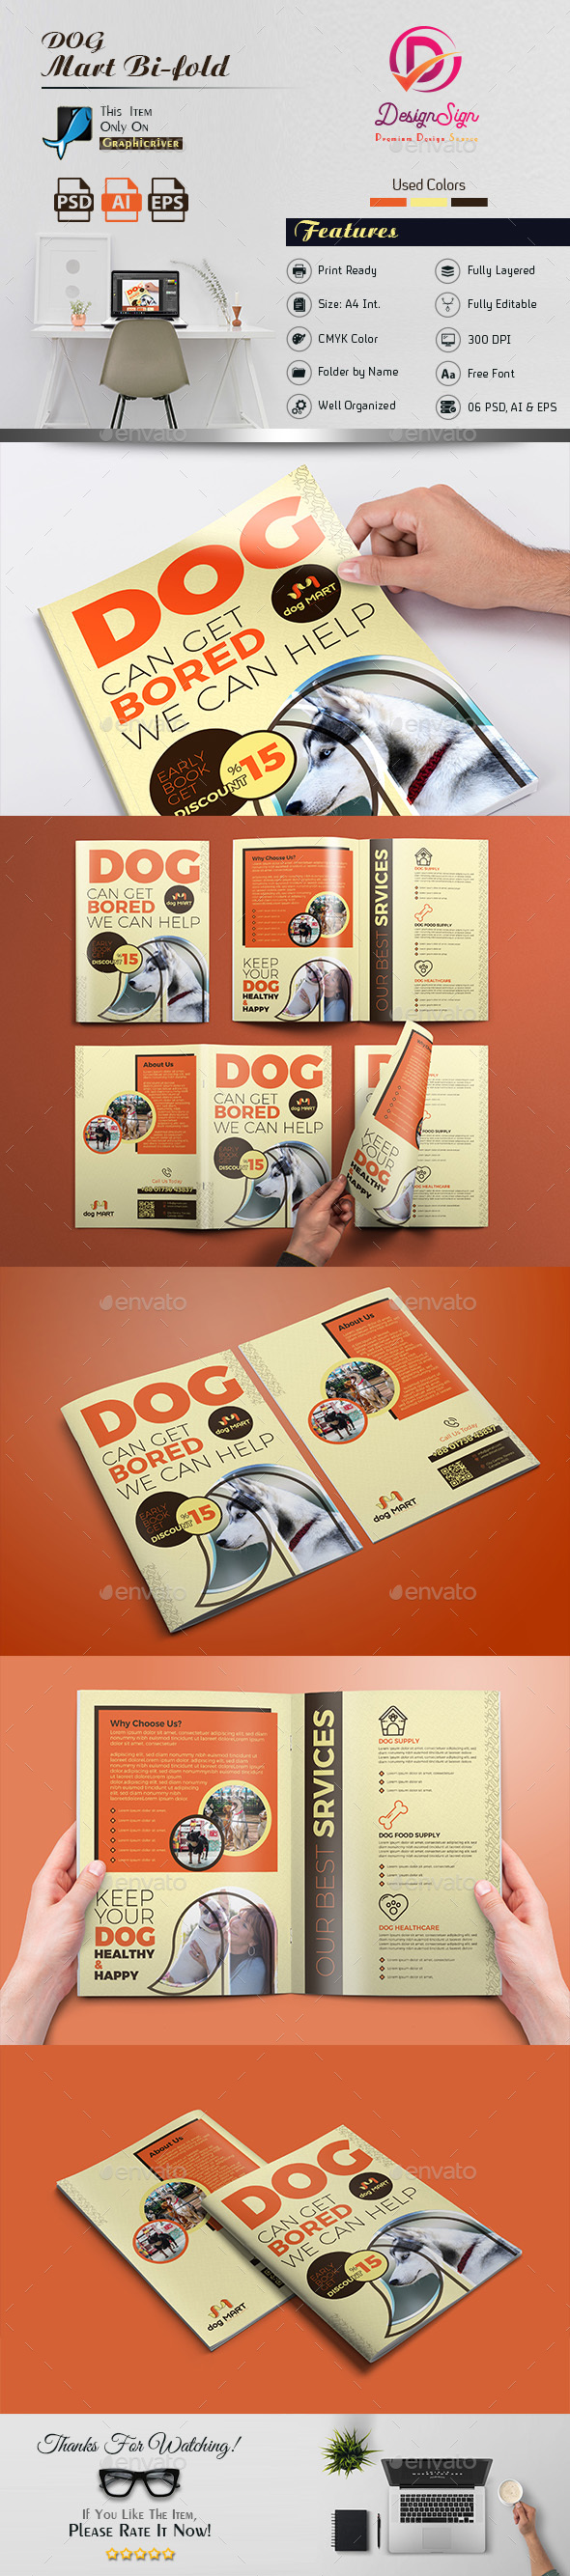 Dog Bi-Fold Brochure - Brochures Print Templates